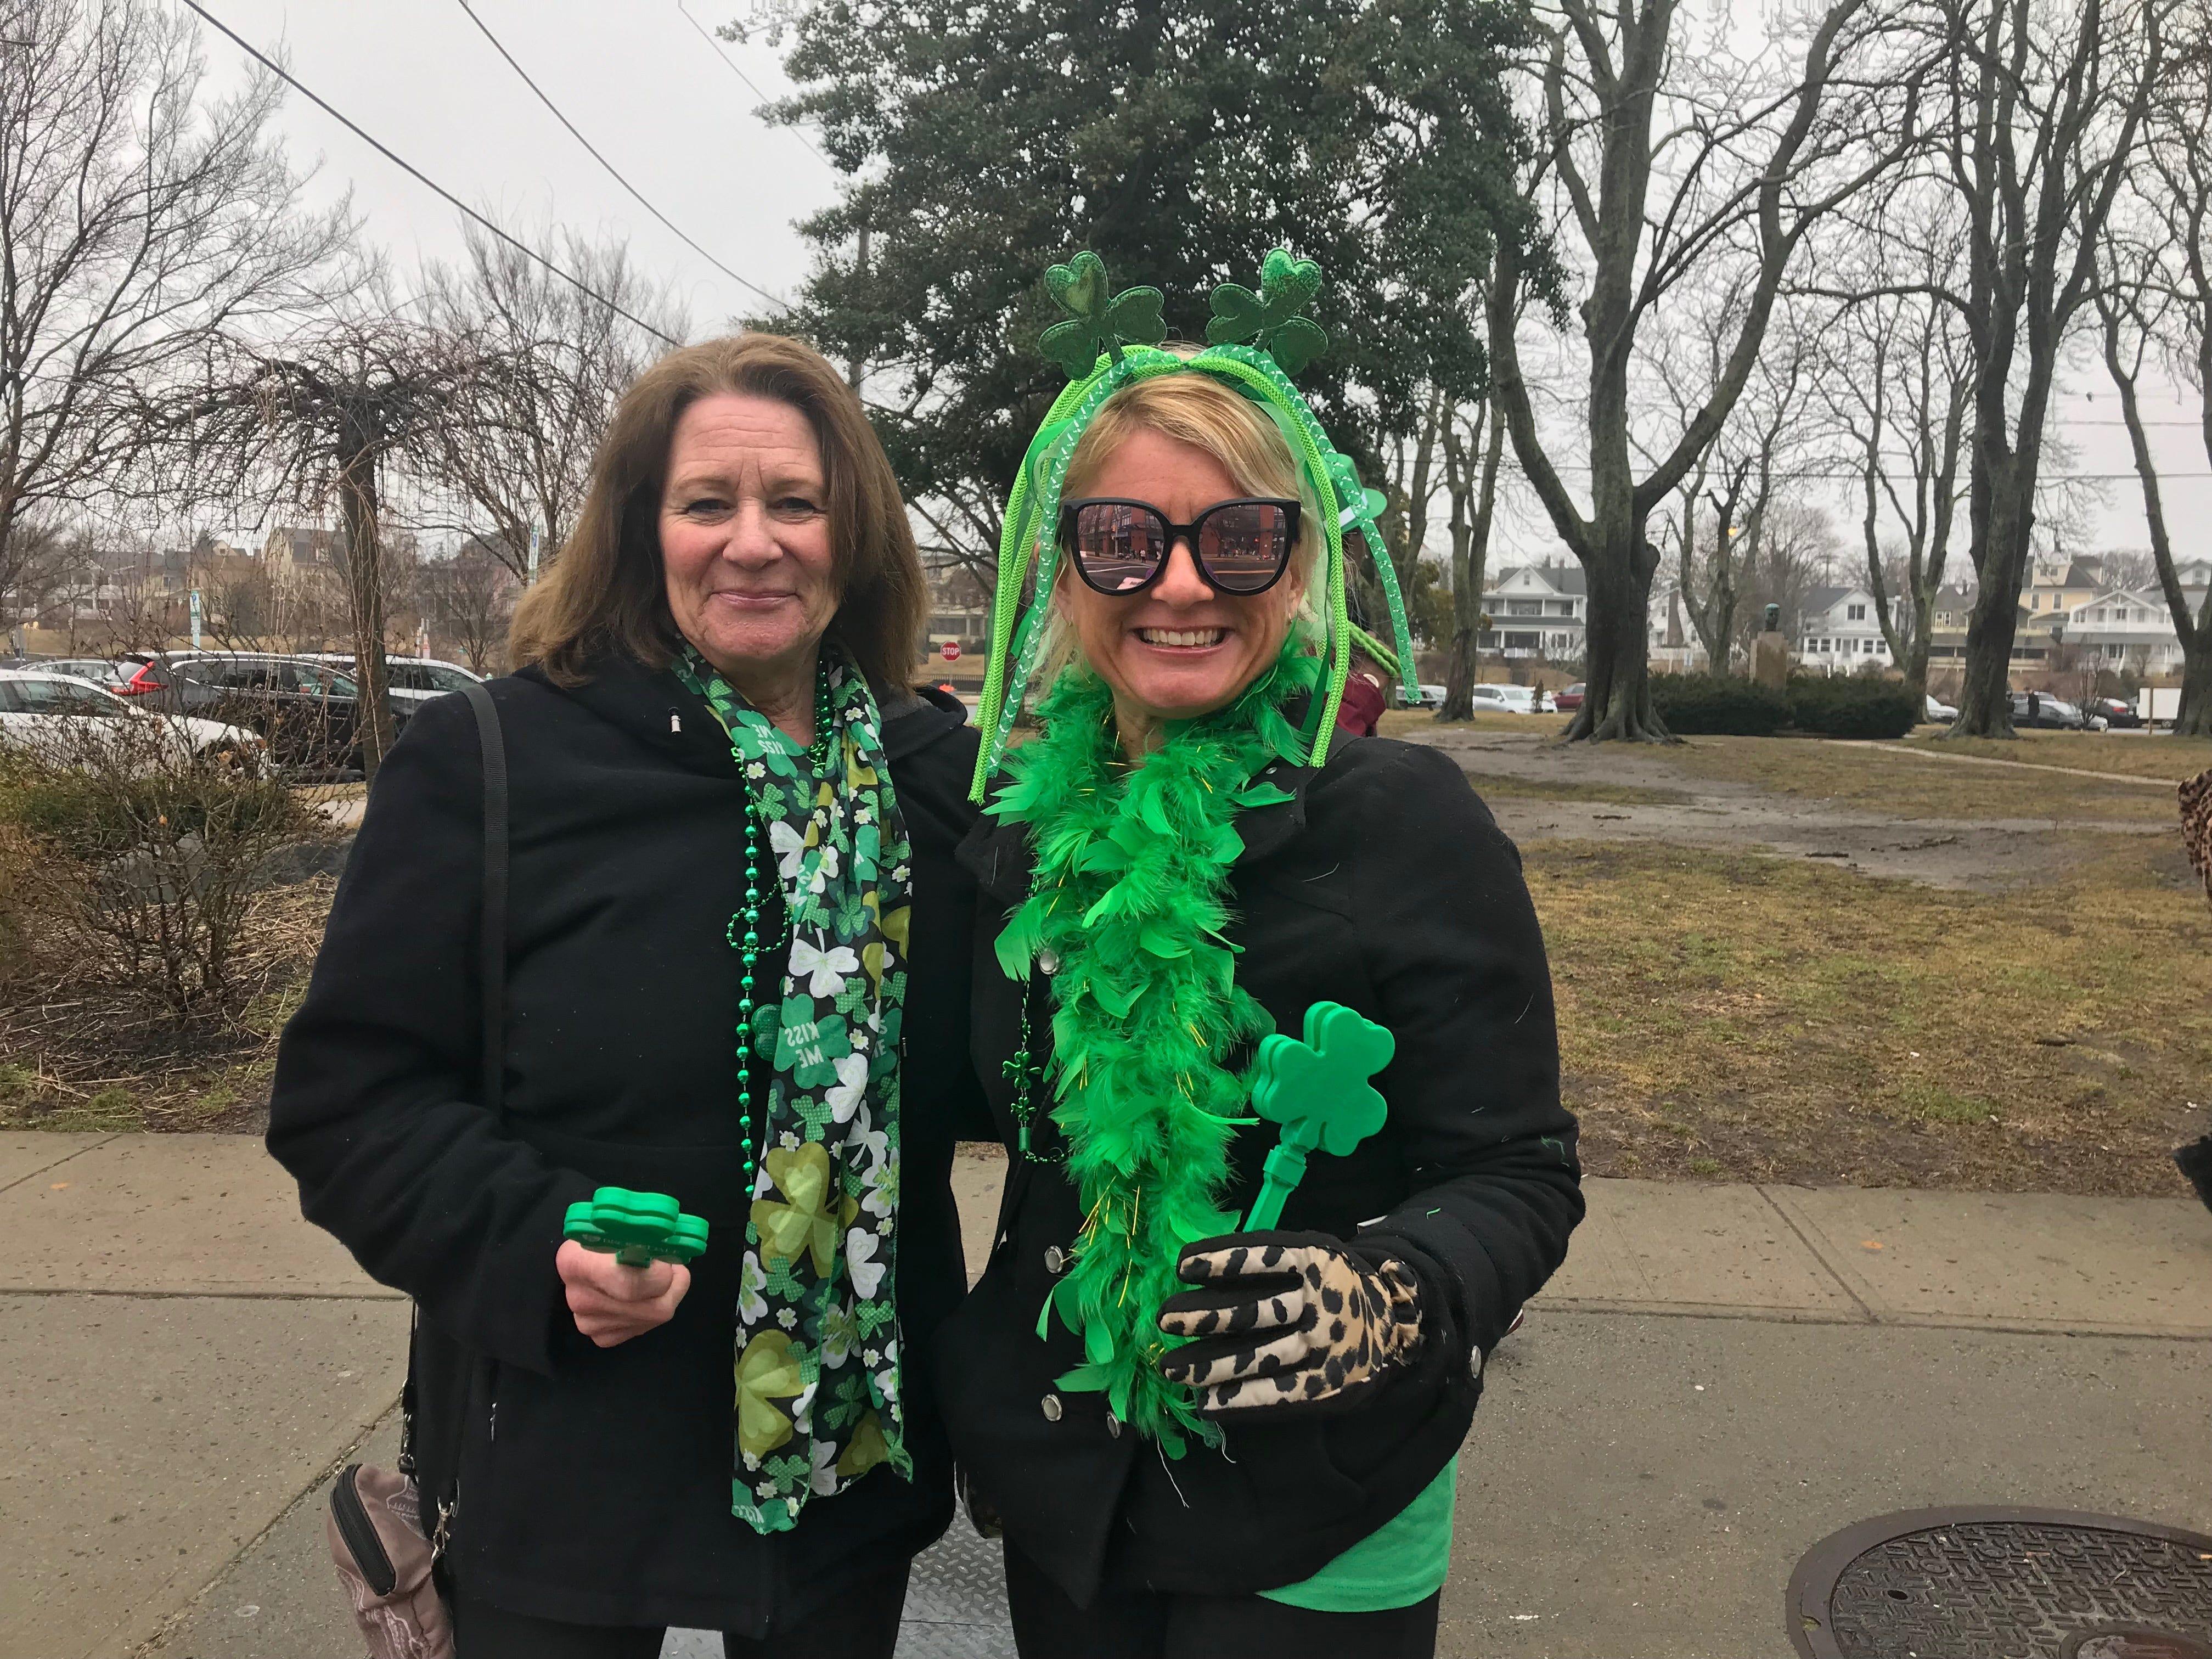 Denise Pliszka of Quakertown, Pennsylvania stands on Cookman Avenue with her daughter Katie Pliszka of Ocean Grove.